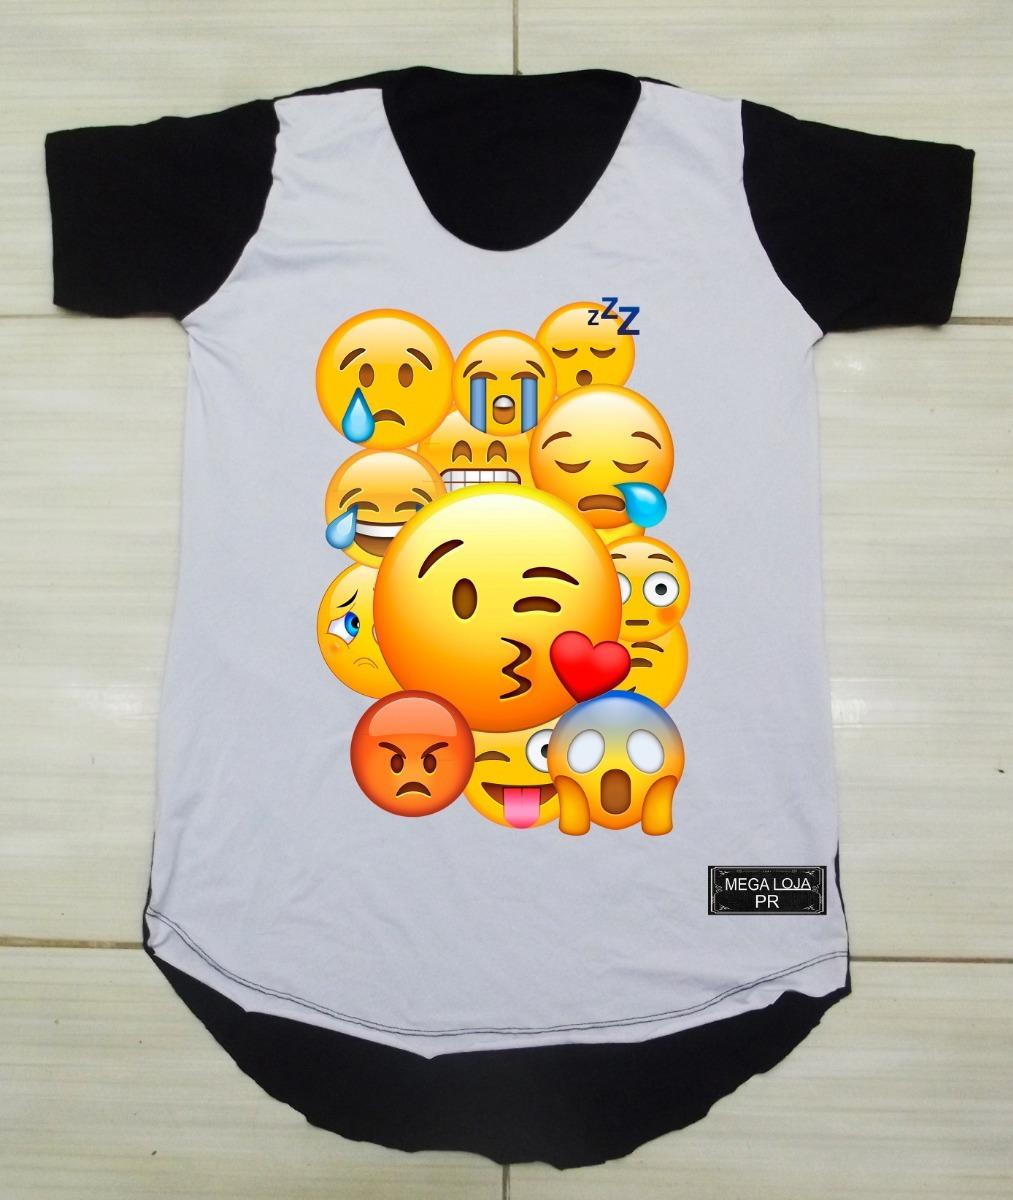 57103b6f93 camiseta longline camisa oversized personalizada emoji. Carregando zoom.